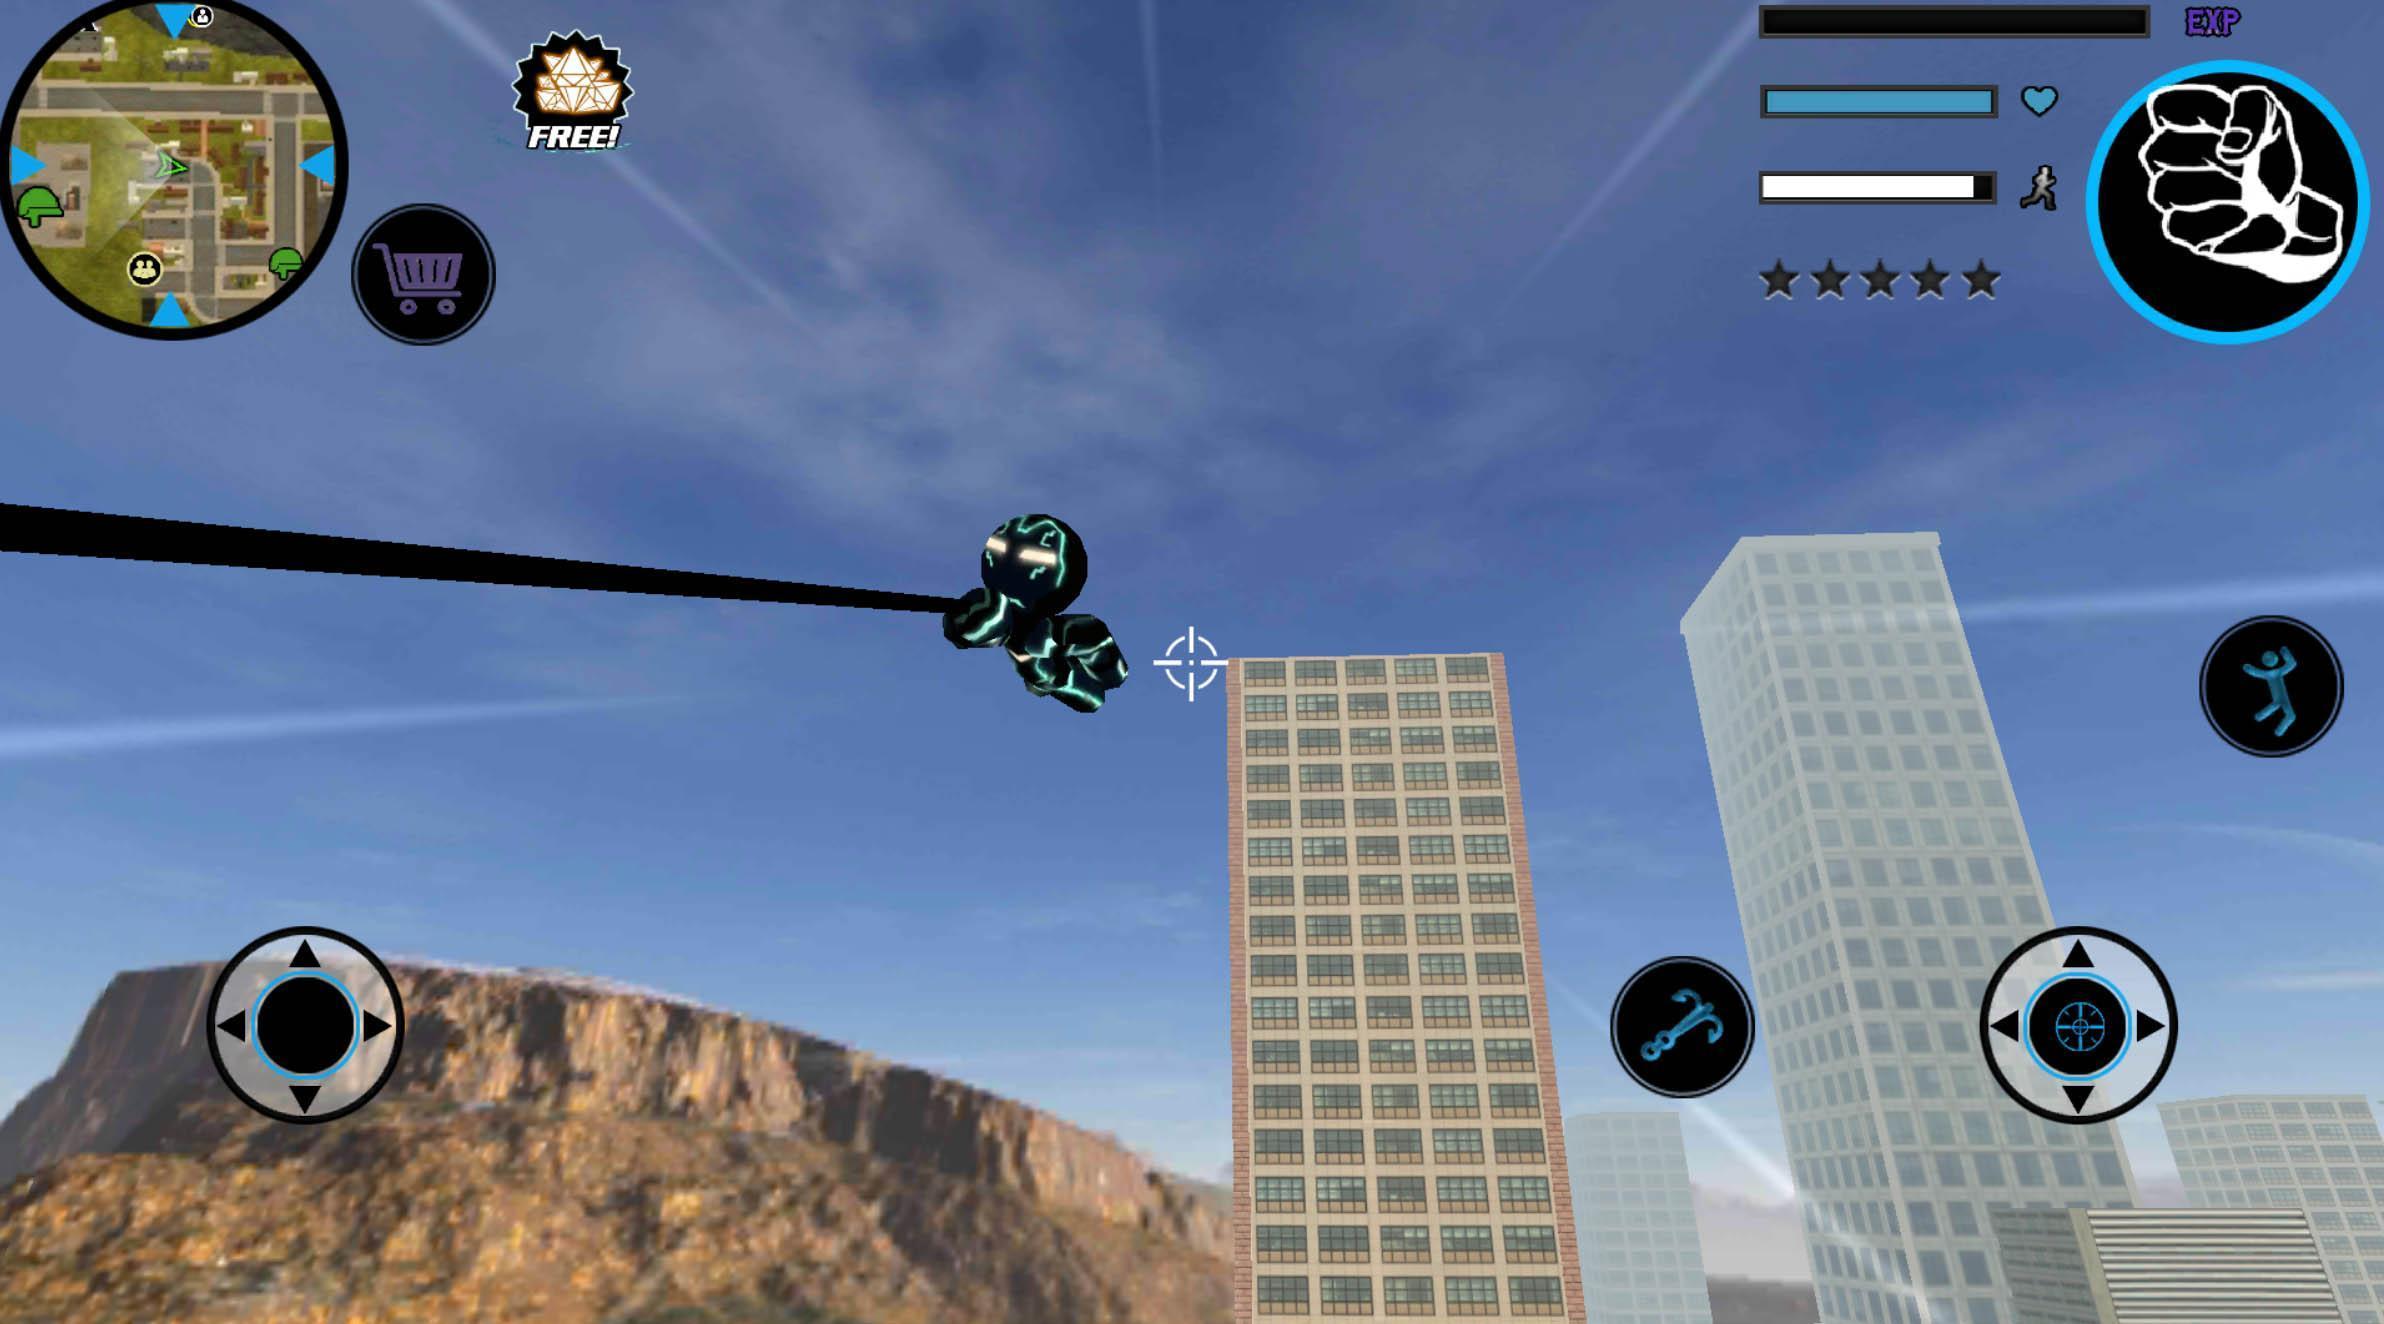 Neon Iron Stickman Rope Hero City Gangstar Mafia 1.6 Screenshot 8